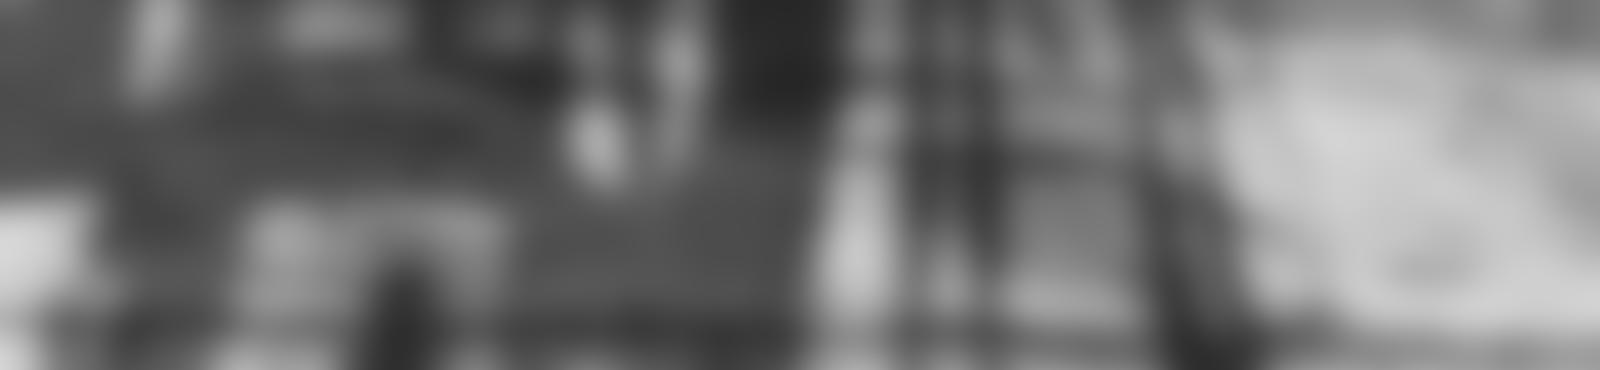 Blurred 8df22c69 cf5a 4209 8895 ae7e1b3ca8ef